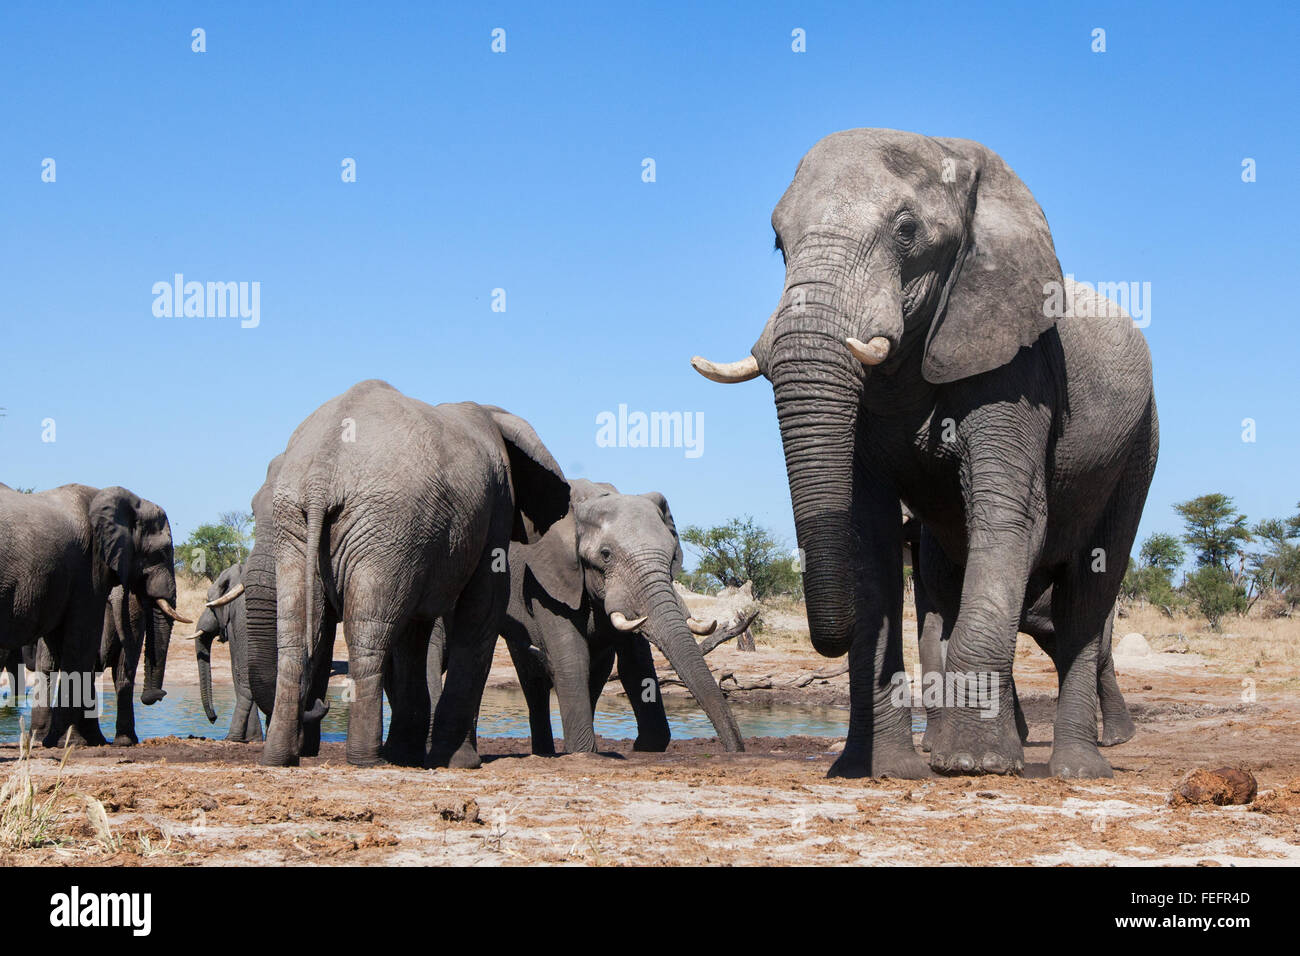 Elephant at a waterhole - Stock Image